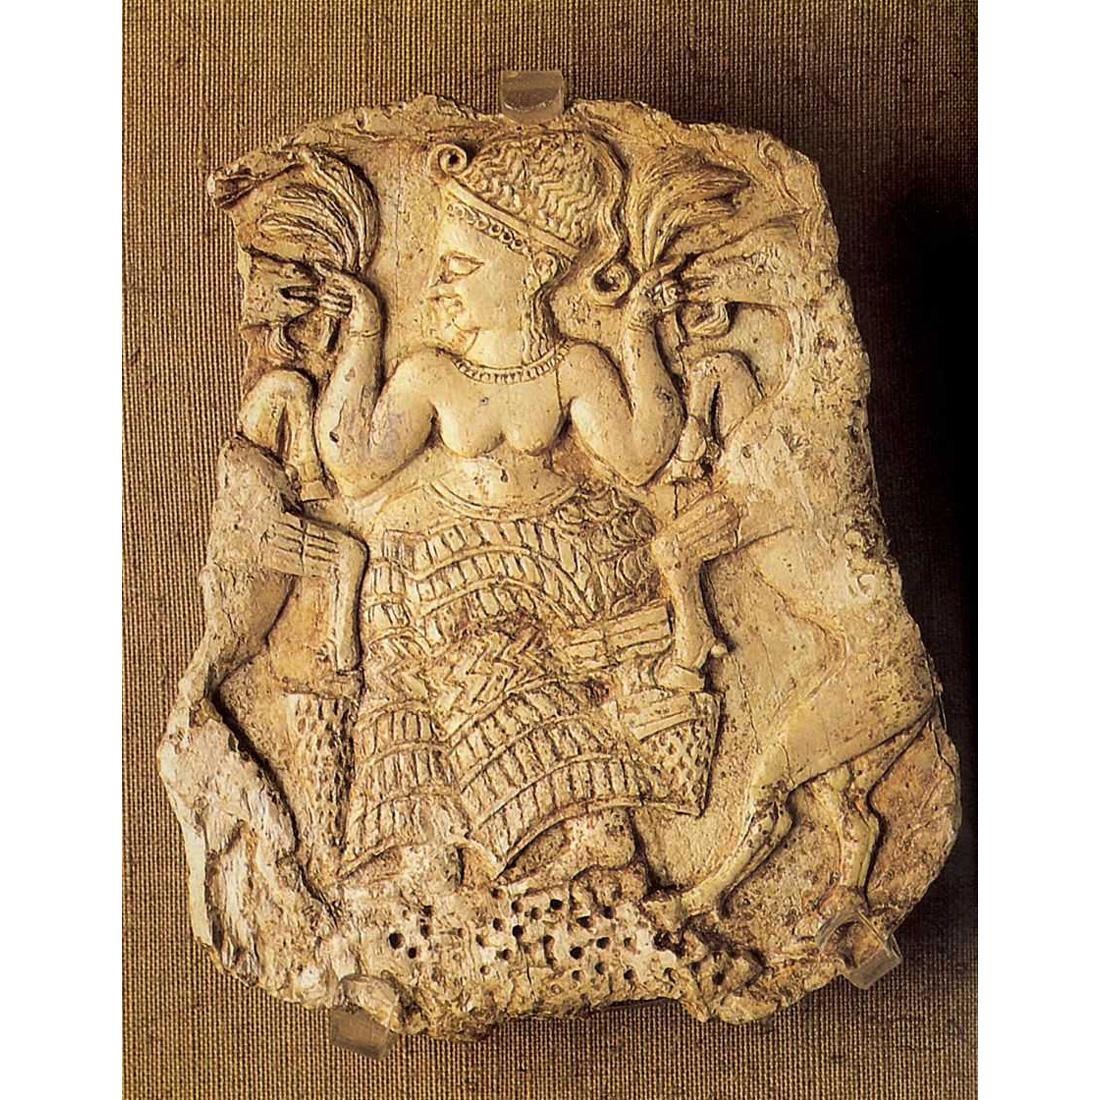 Богиня плодородия, кормящая козлов. XIV в. до н. э.